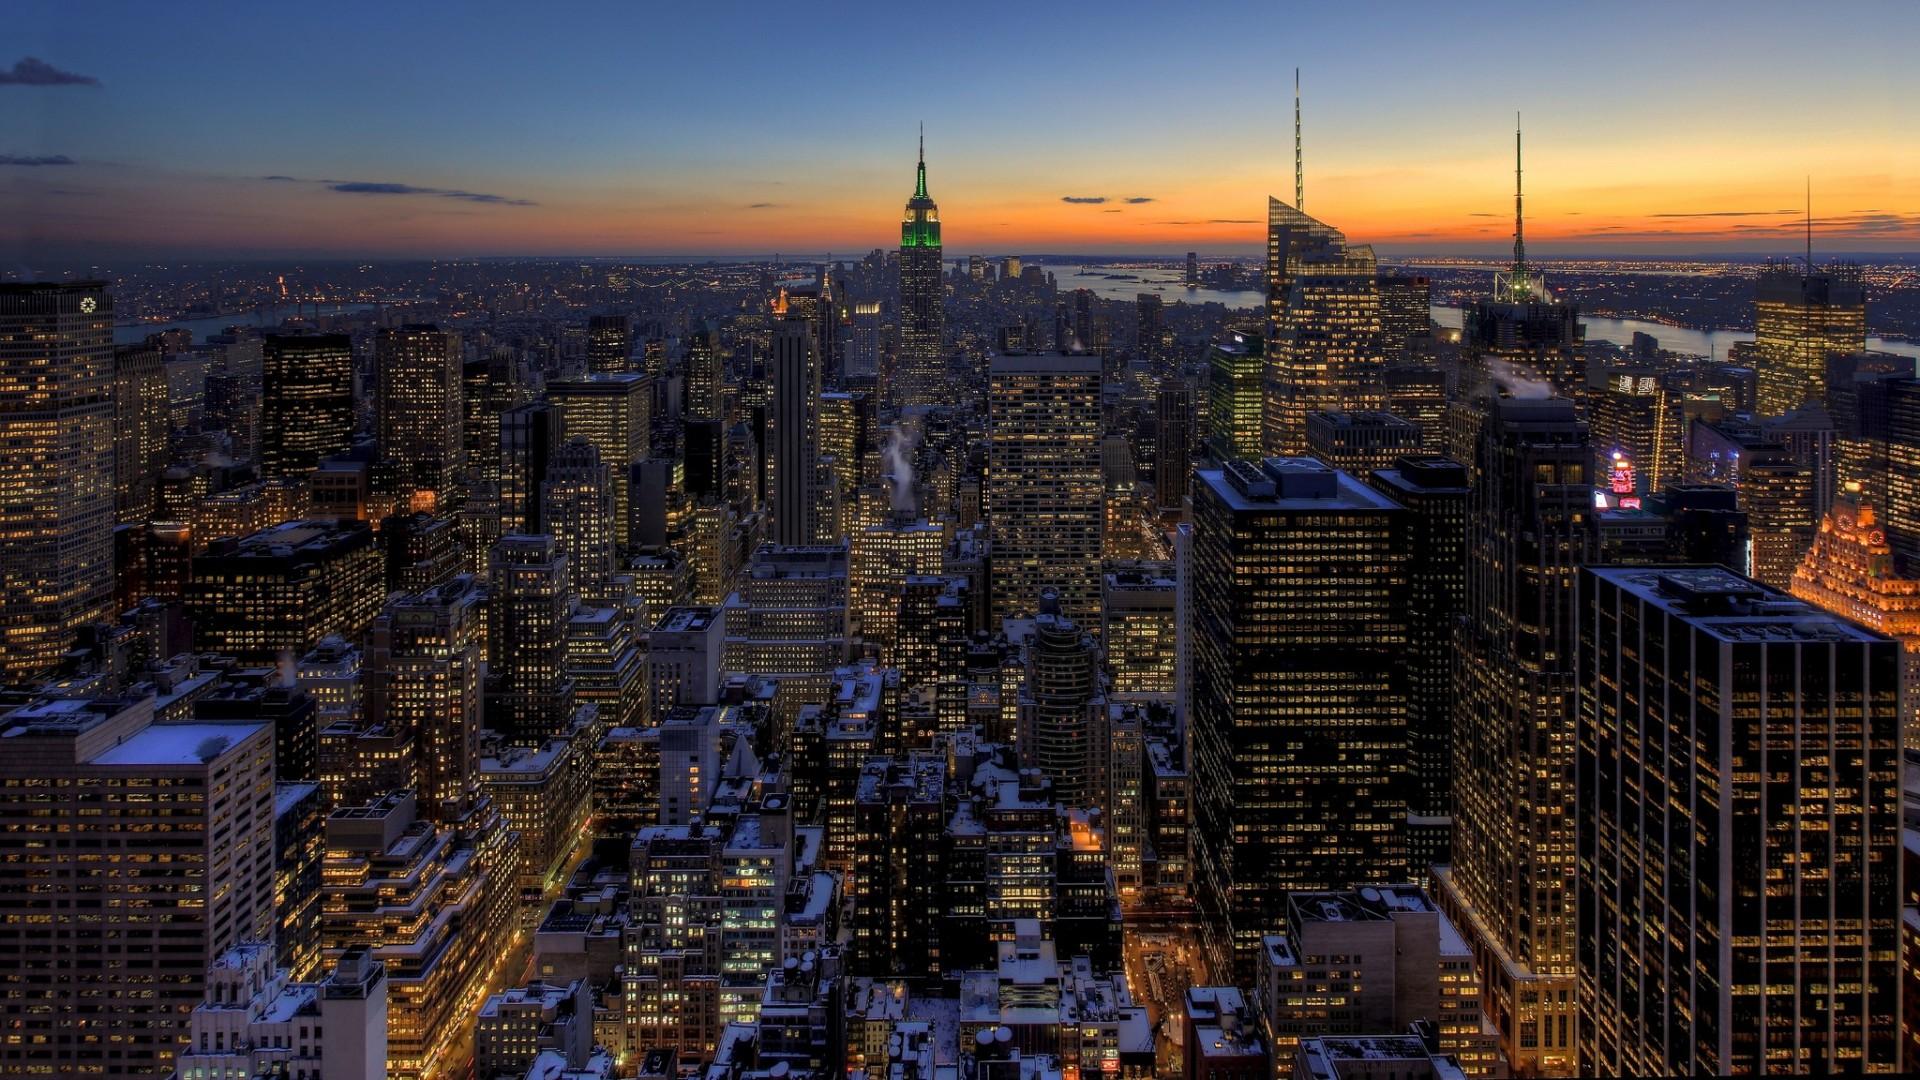 New york city skyline wallpaper sf wallpaper new york city skyline wallpapers high quality download free voltagebd Gallery